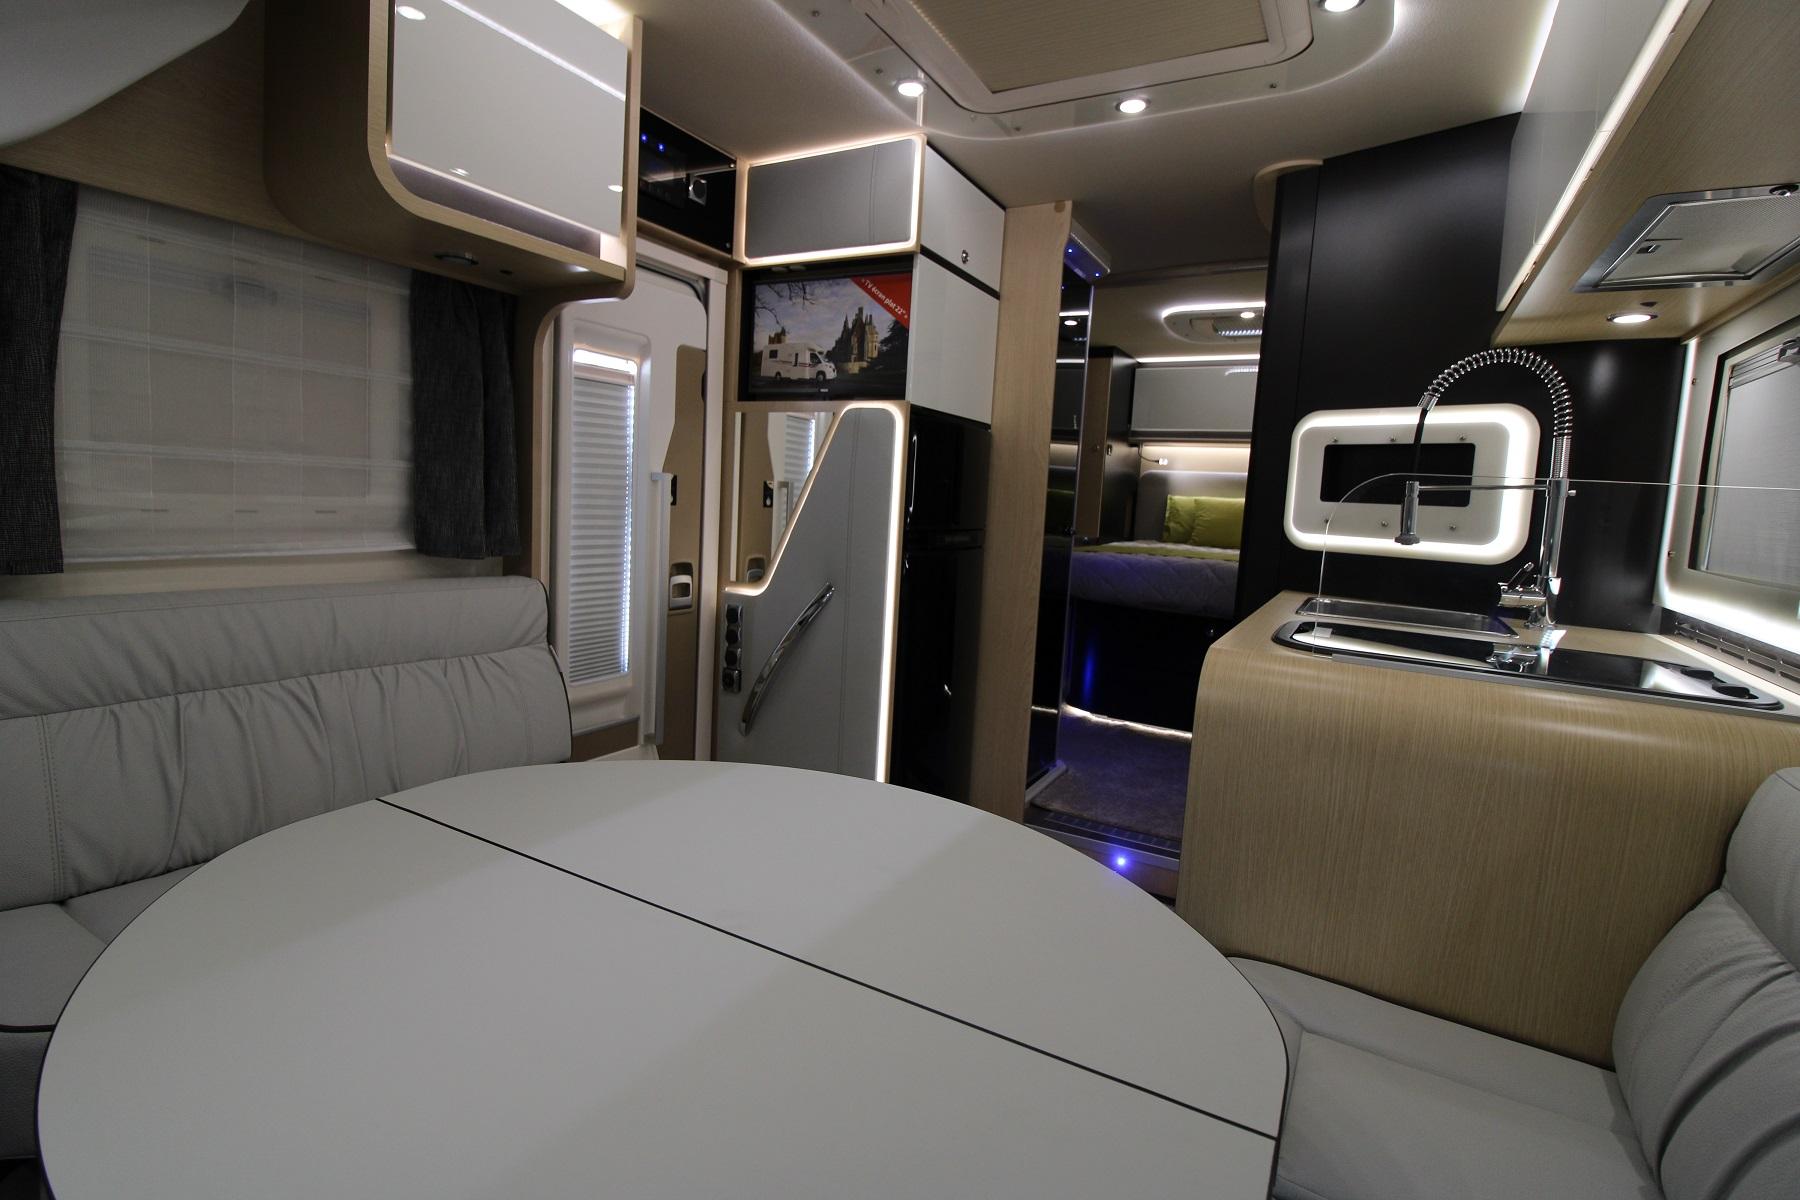 Autostar I730 Lc Prestige Design Edition - 23